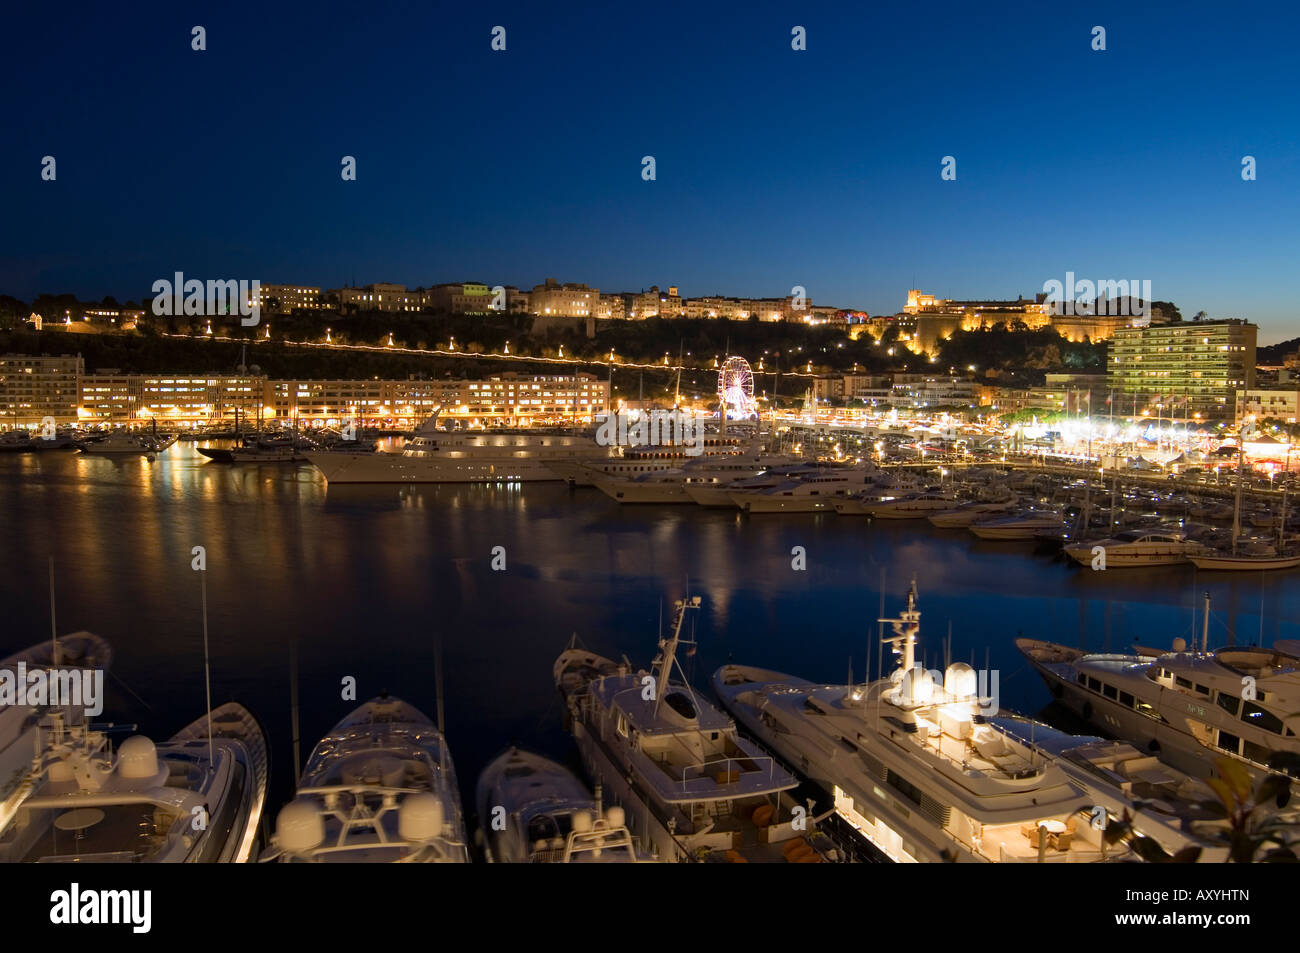 Monte Carlo, Principality of Monaco, Cote d'Azur, Mediterranean, Europe - Stock Image